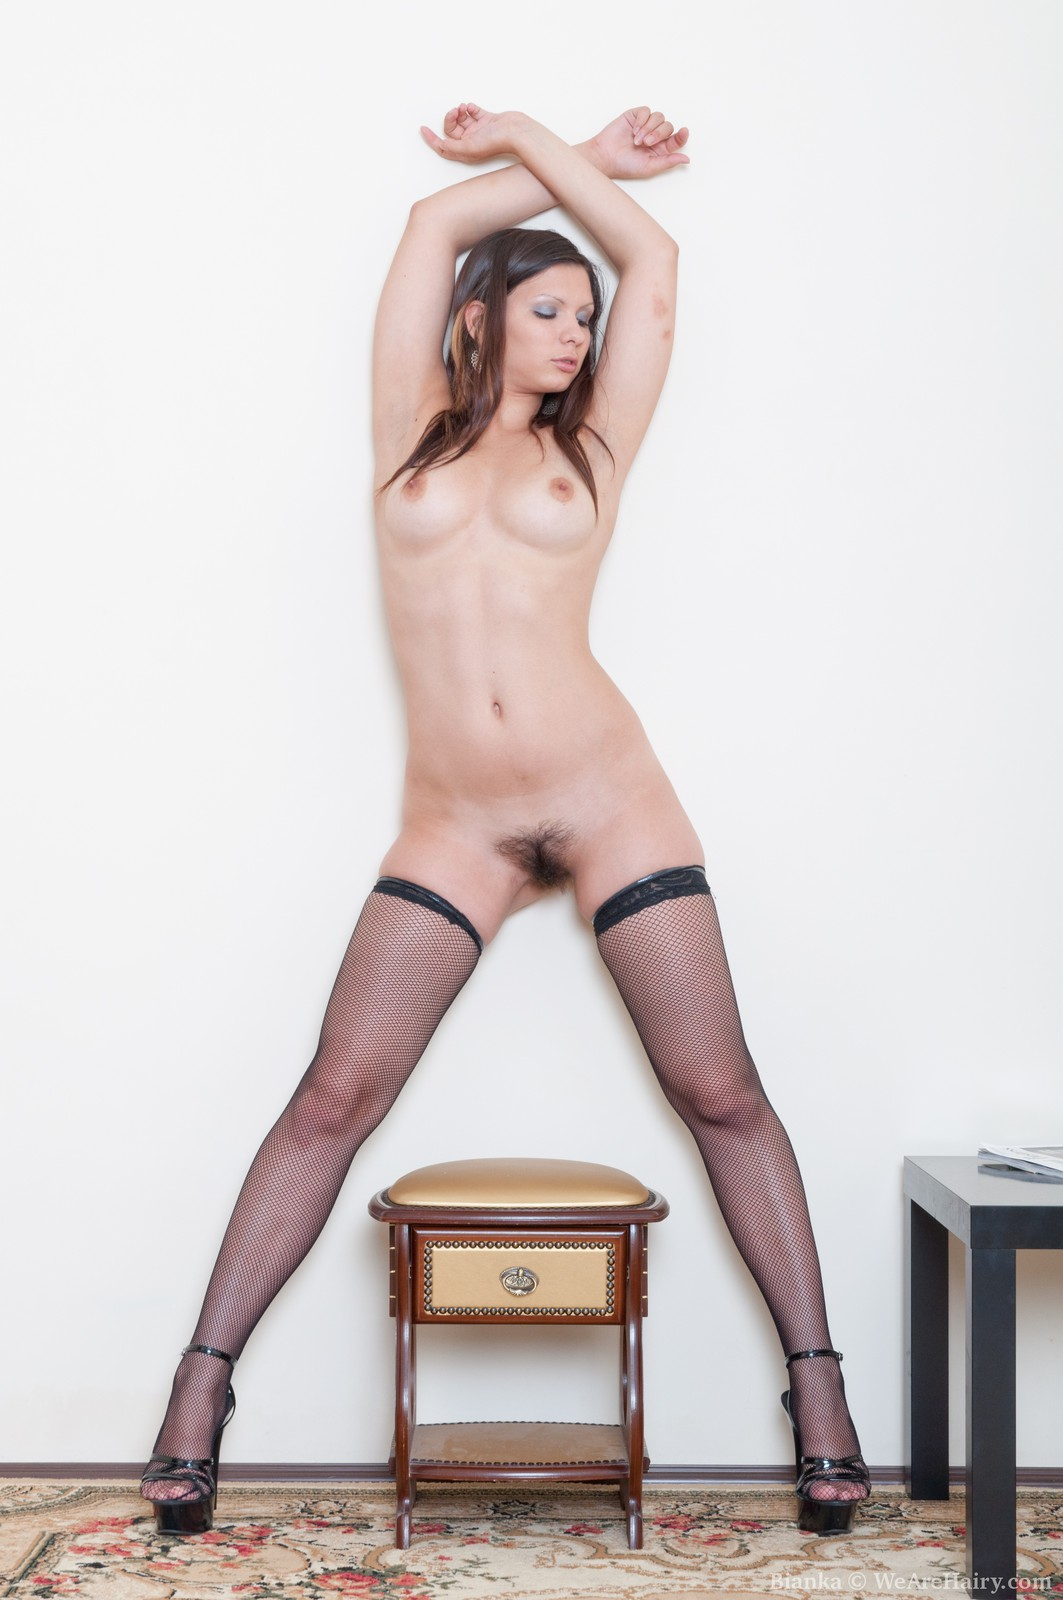 sophie choudri nude fuck photo